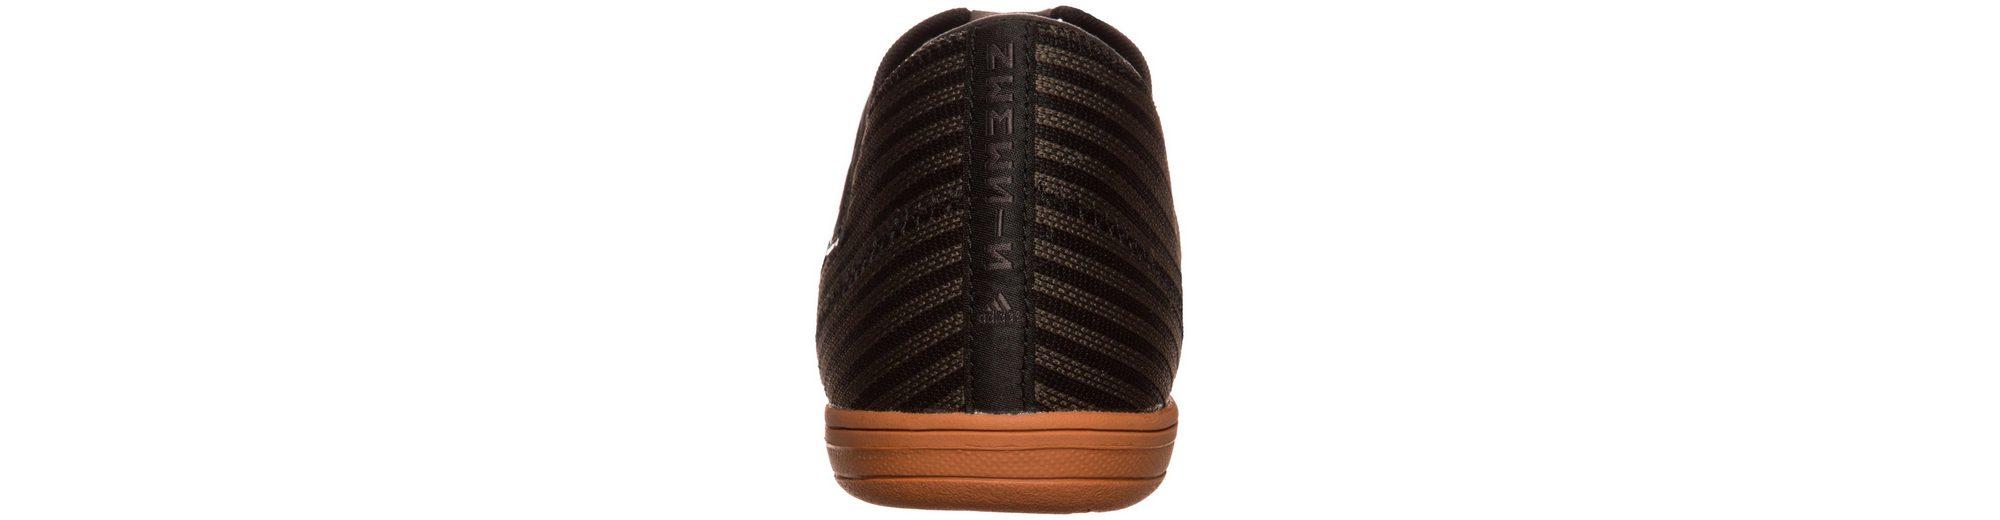 Größte Anbieter Offizielle Seite Günstiger Preis adidas Performance Nemeziz 17.4 Sala Fußballschuh BqpvkEF8j